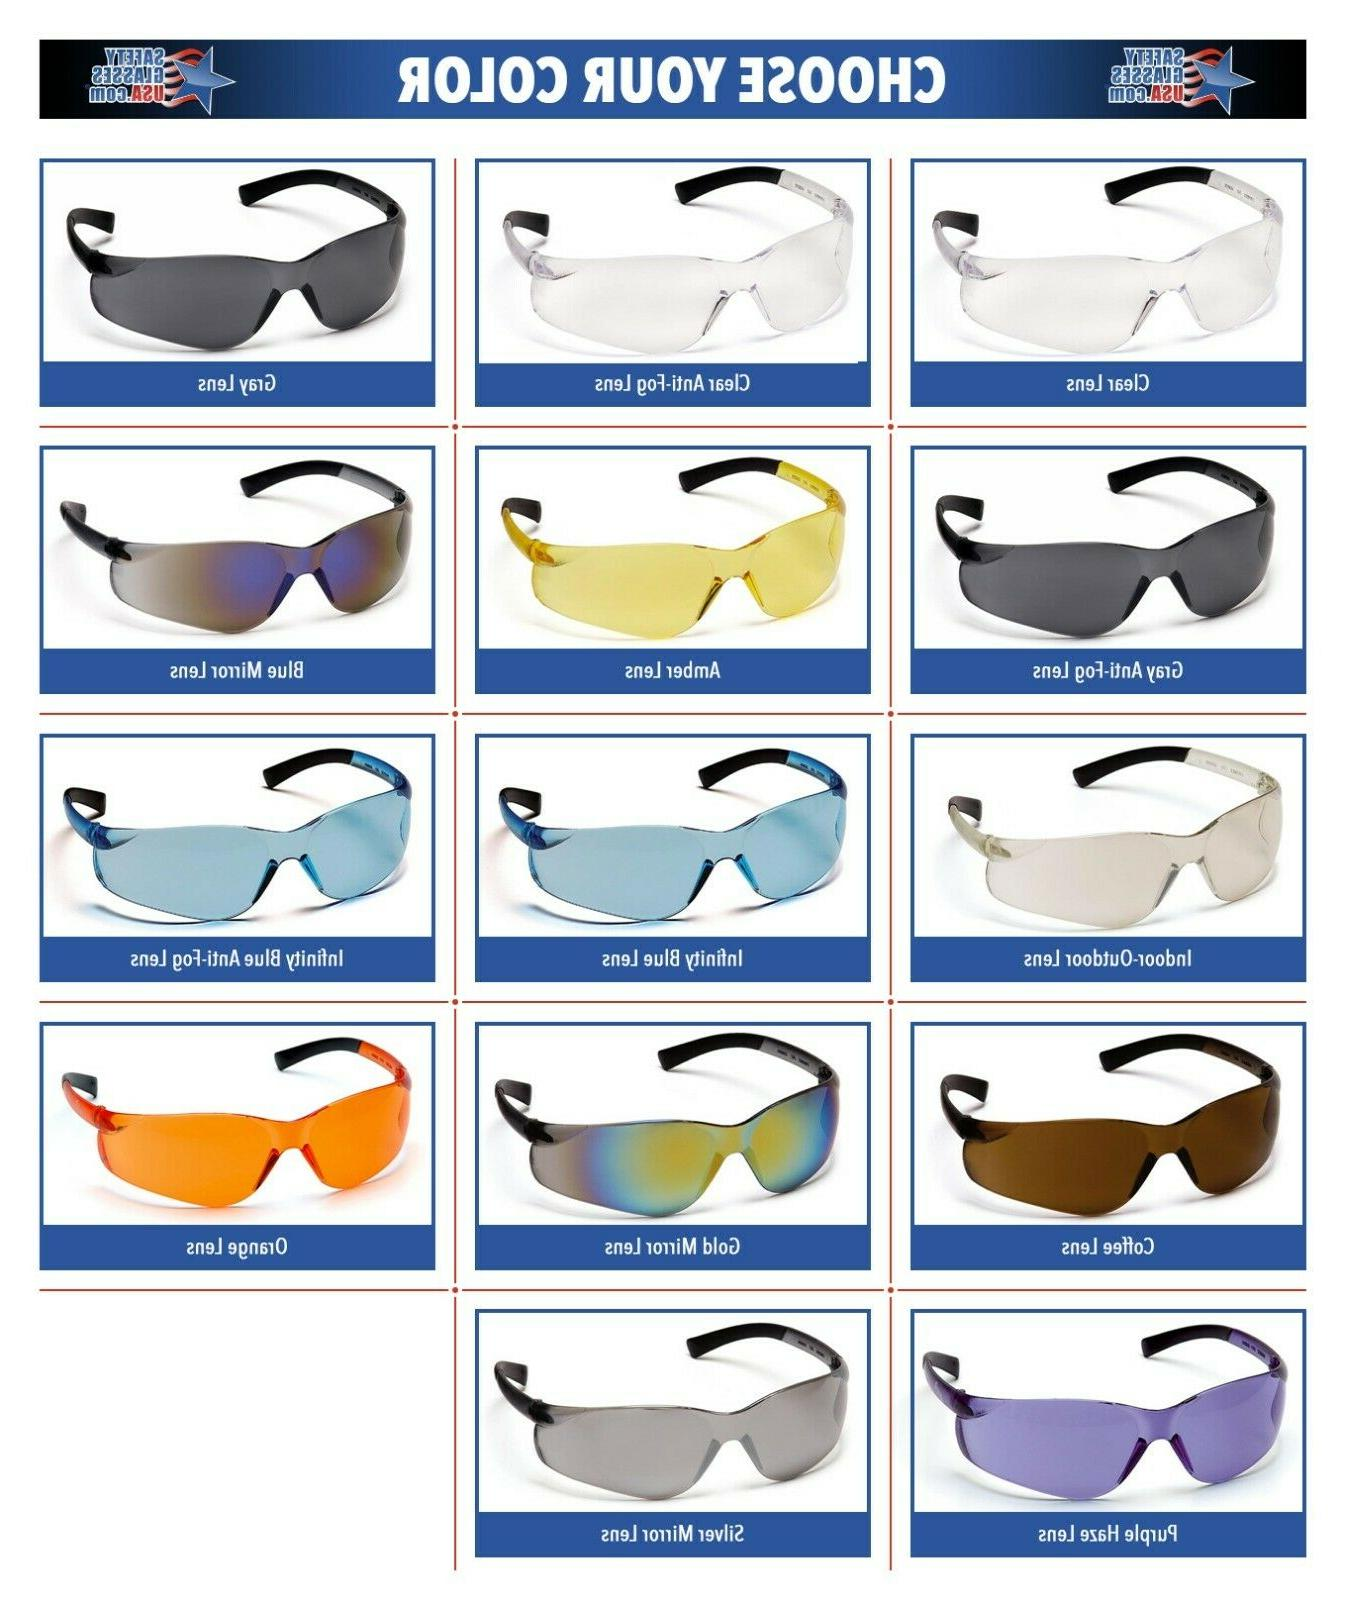 ztek safety glasses work eyewear choose your